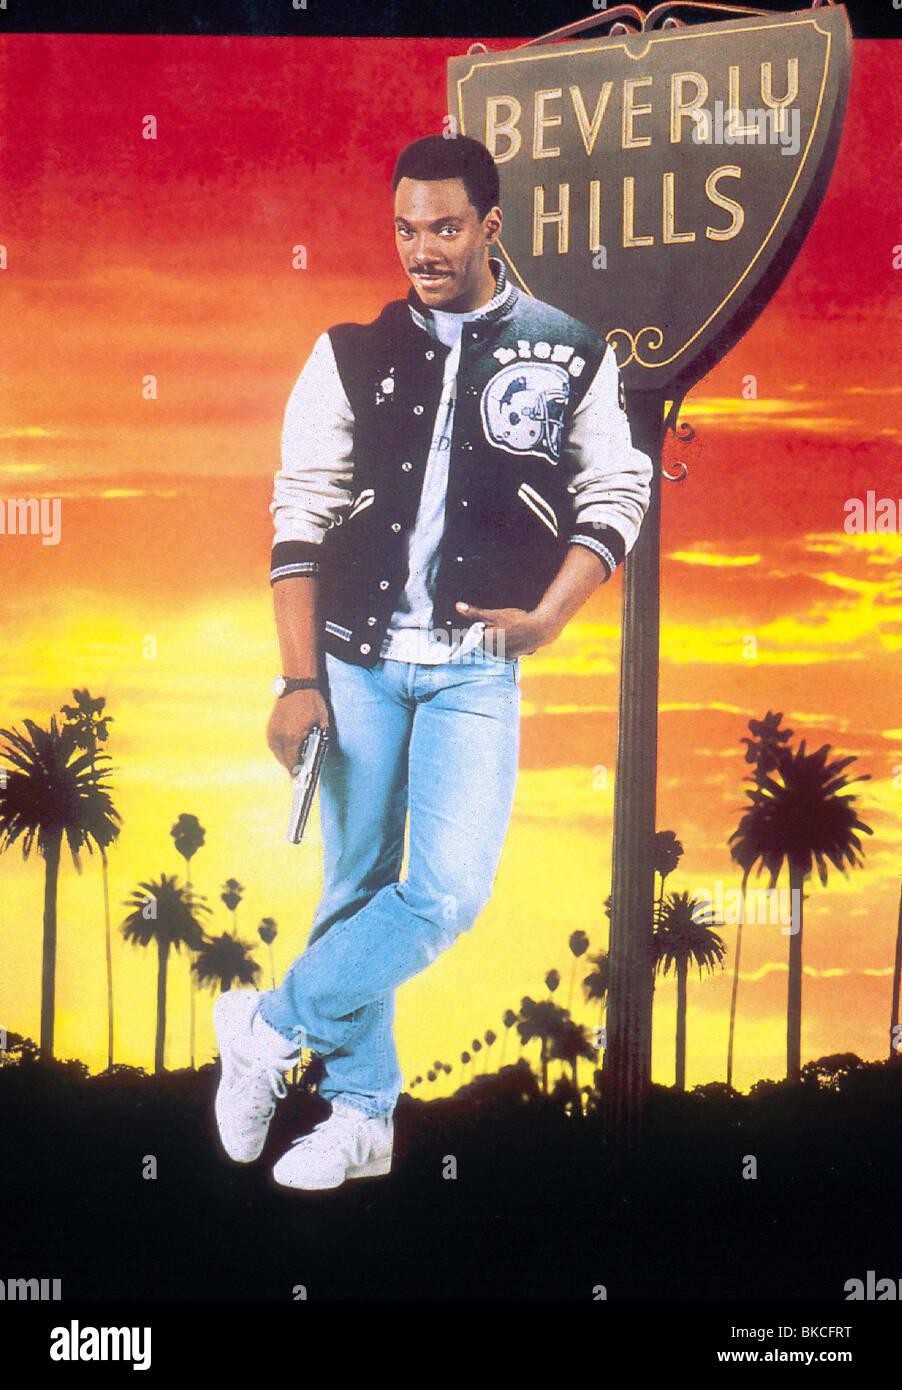 Beverly Hills Cop Ii 1987 Beverly Hills Cop 2 Alt Eddie Murphy Stock Photo Alamy